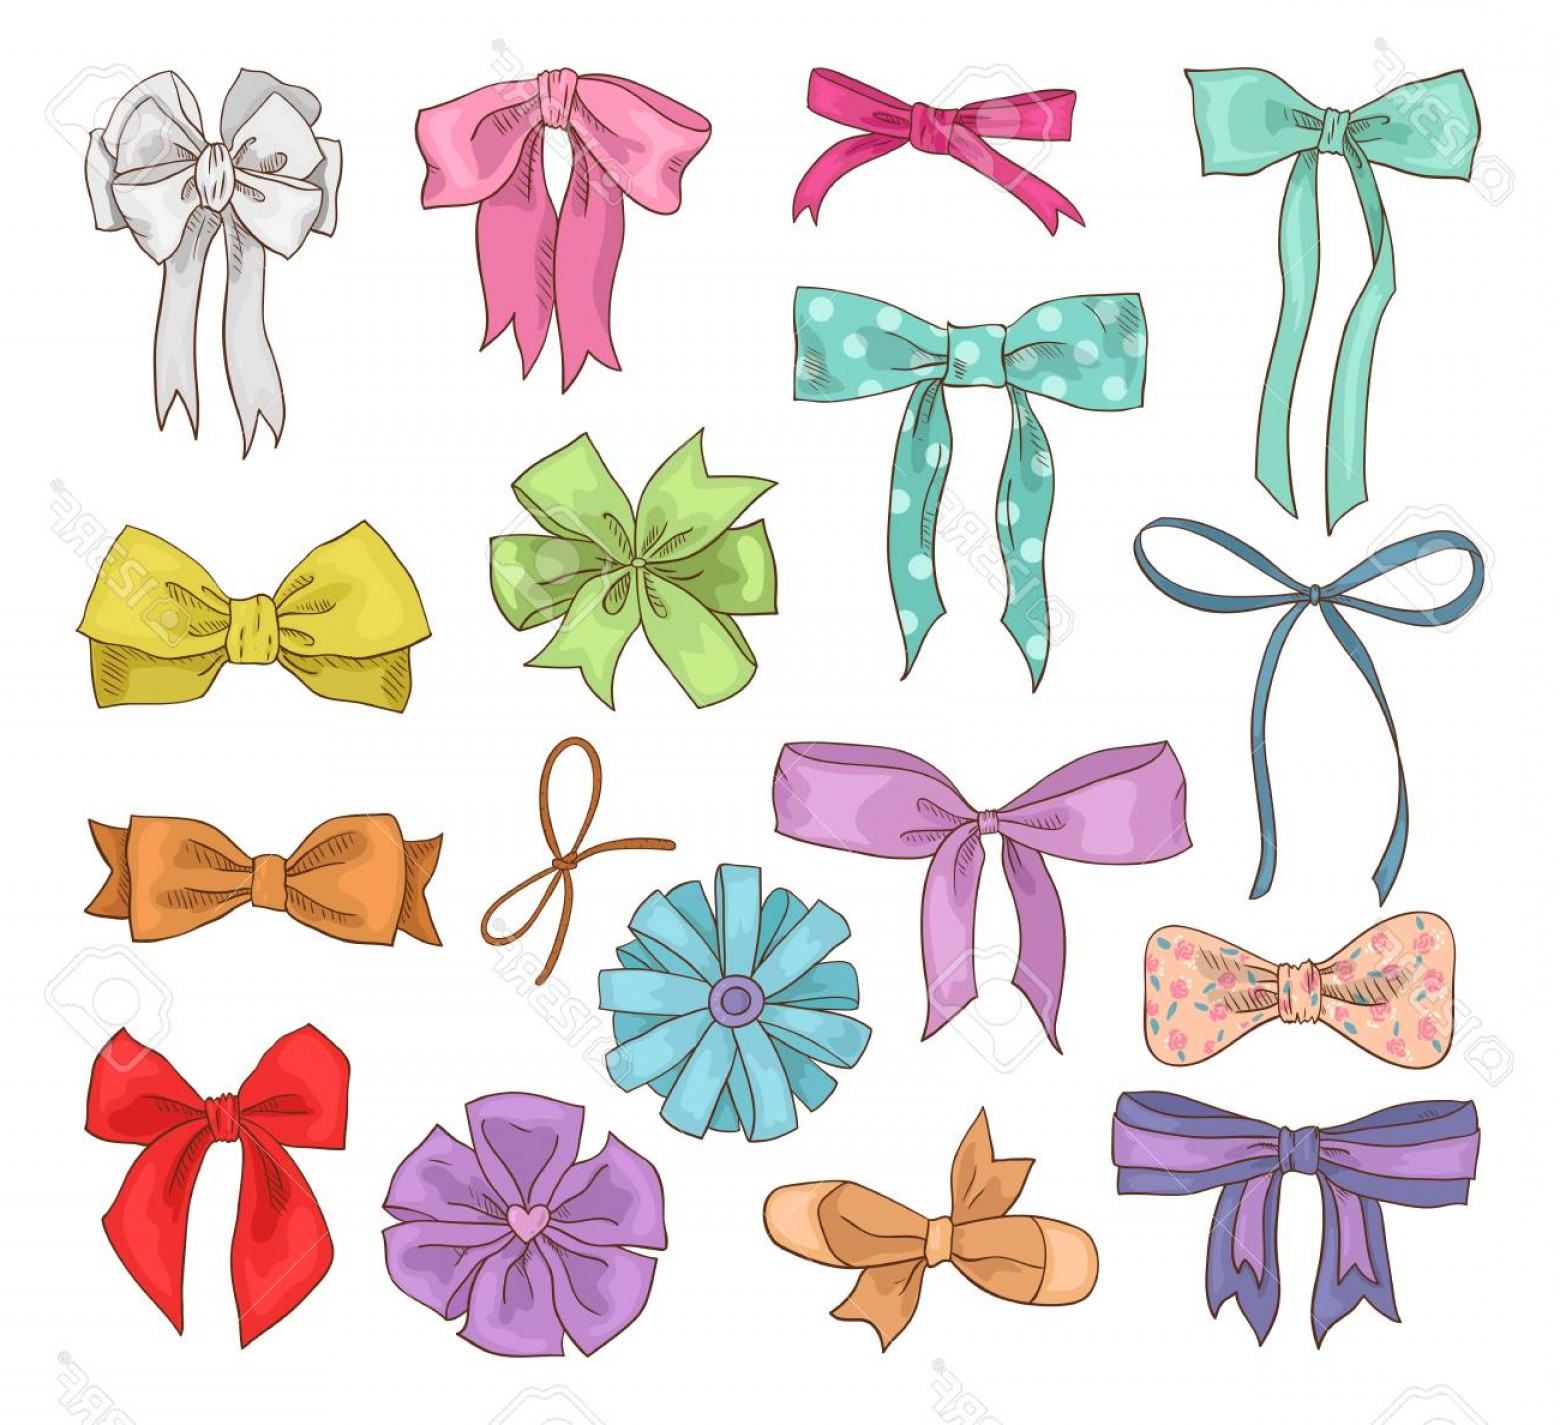 1560x1425 Photostock Vector Girls Bow Vector Girlish Bow Knot Or Girly